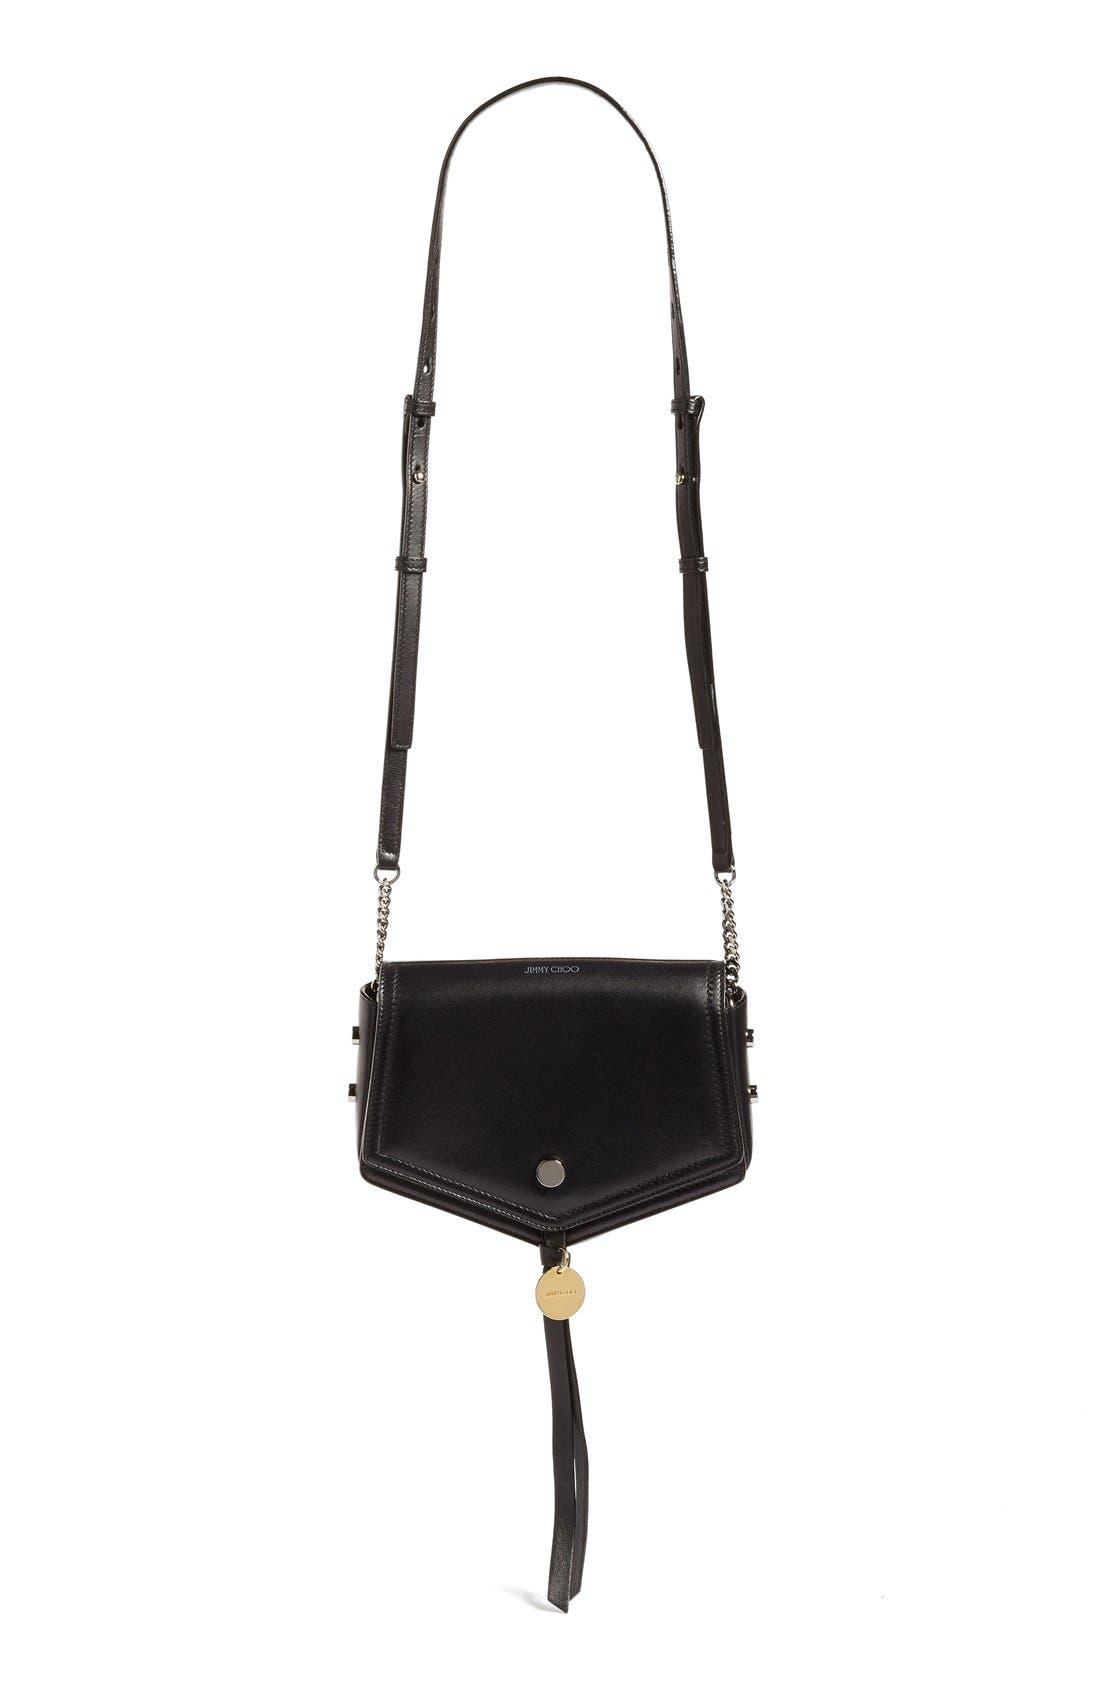 Jimmy Choo Arrow Leather Shoulder Bag